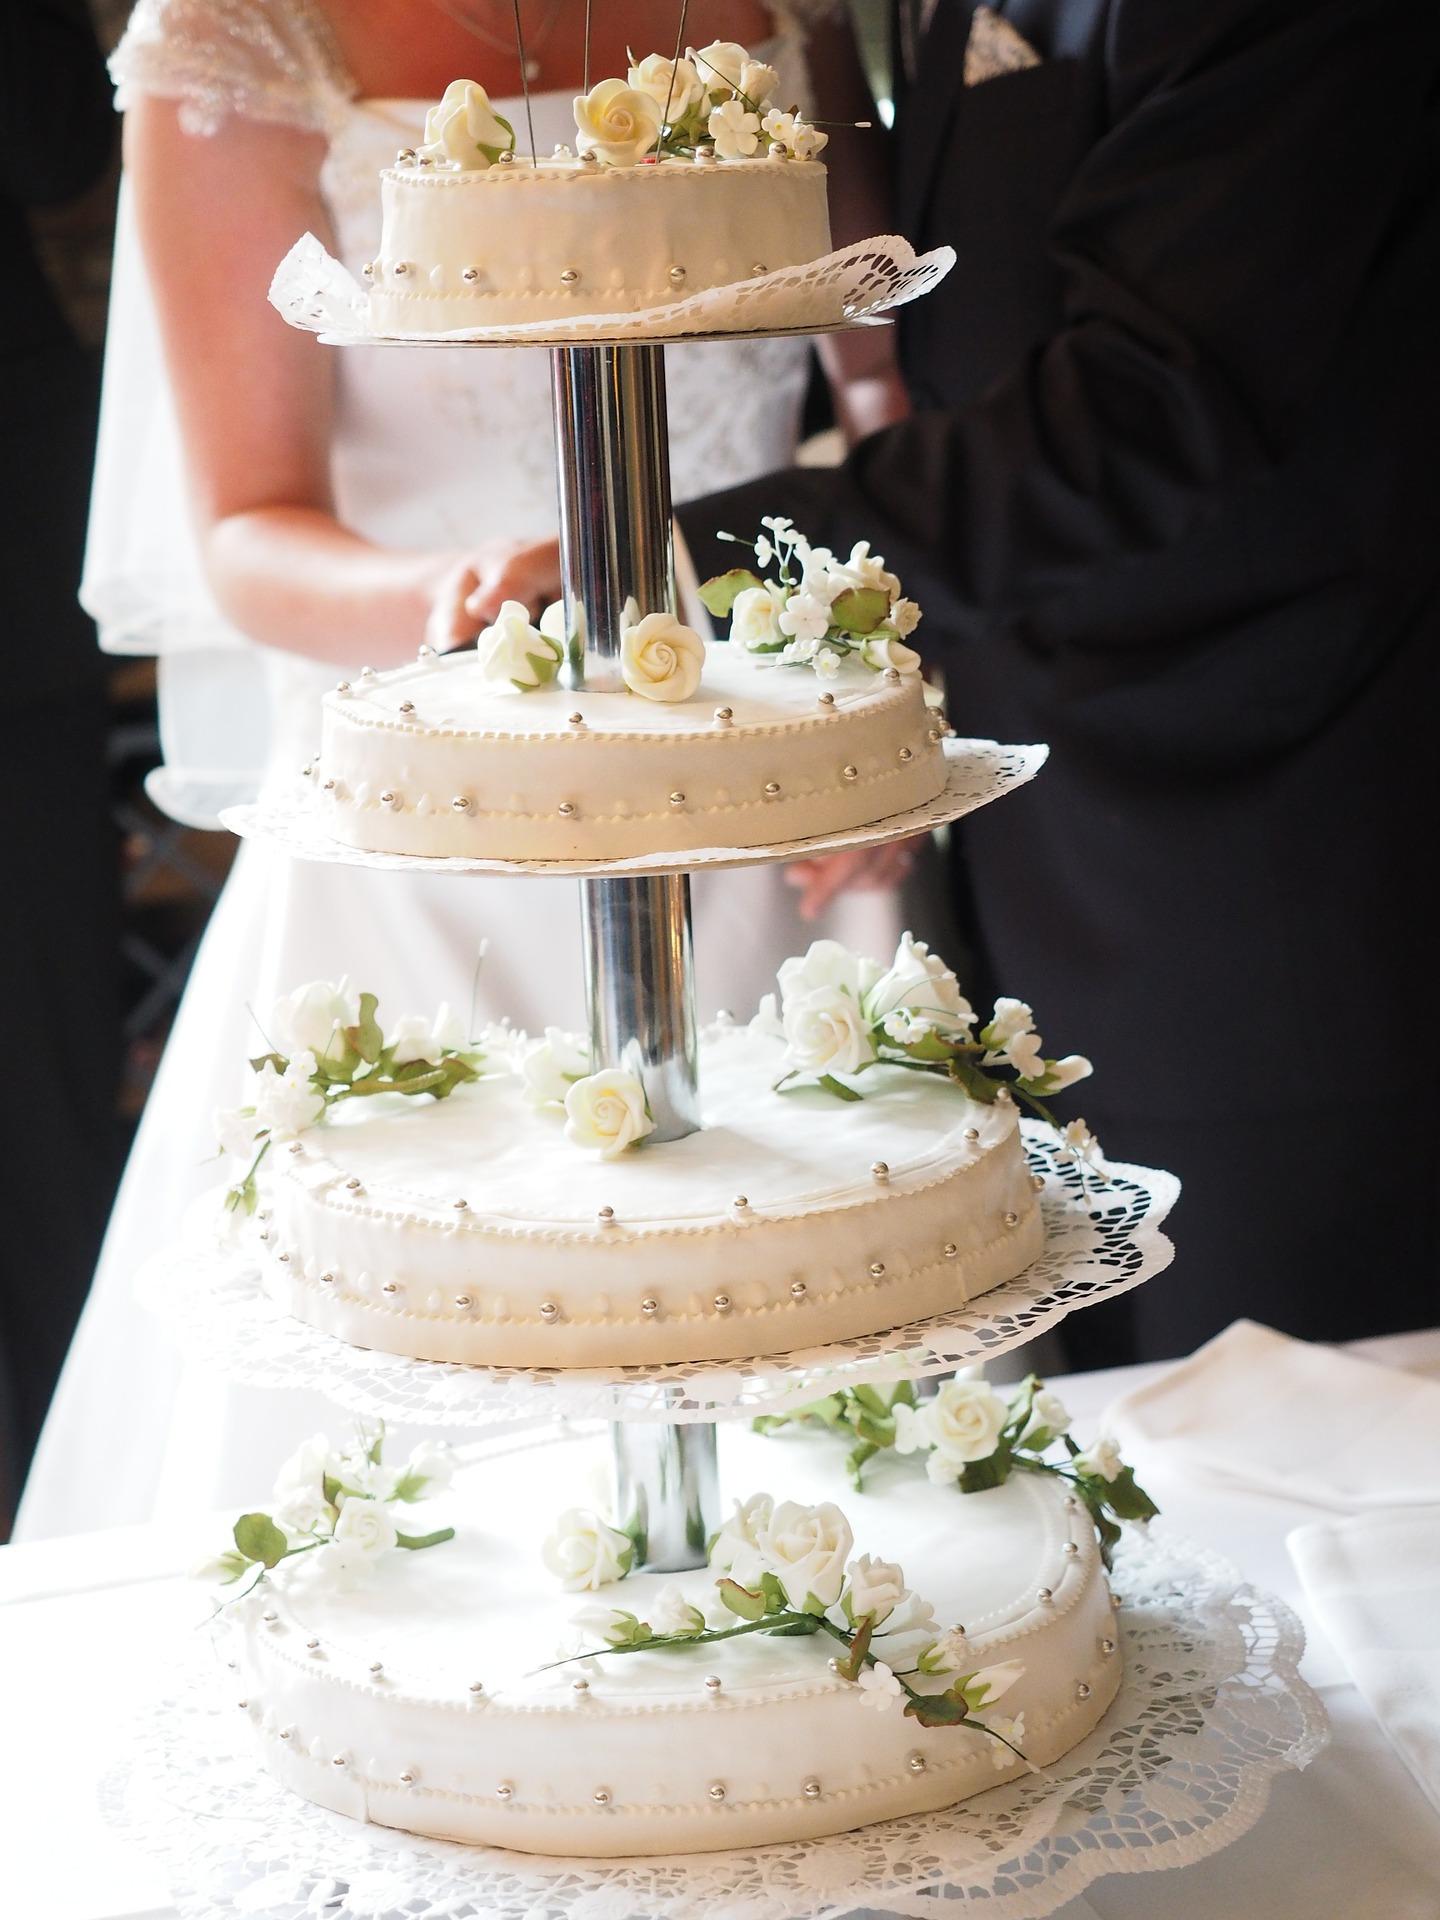 https://cakezoneonline.co.uk/wp-content/uploads/2018/03/cake-590774_1920.jpg